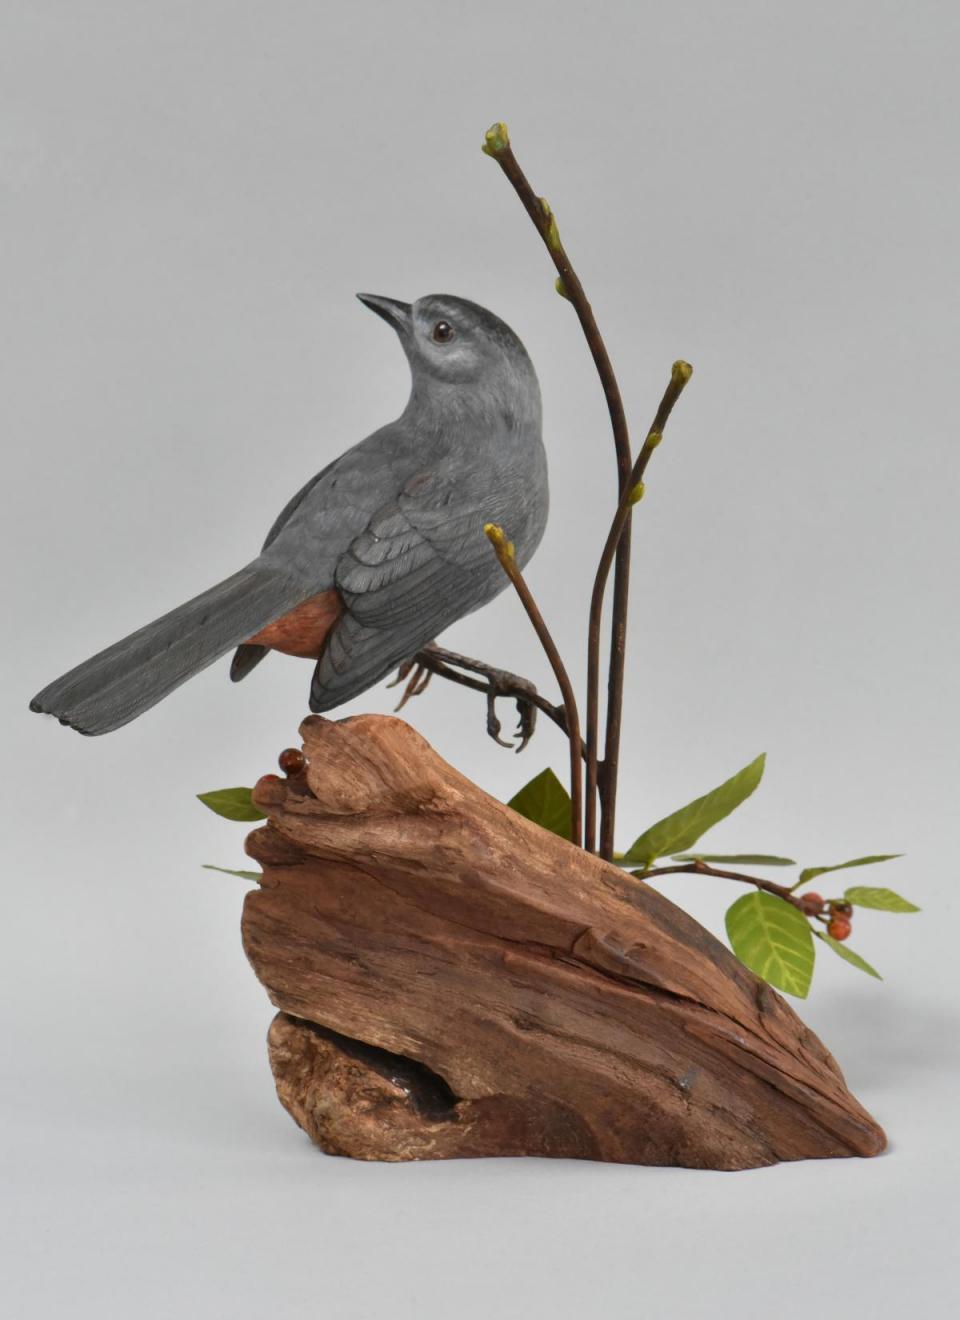 Add Artwork | Sculpture by Uta Strelive | Artists for Conservation